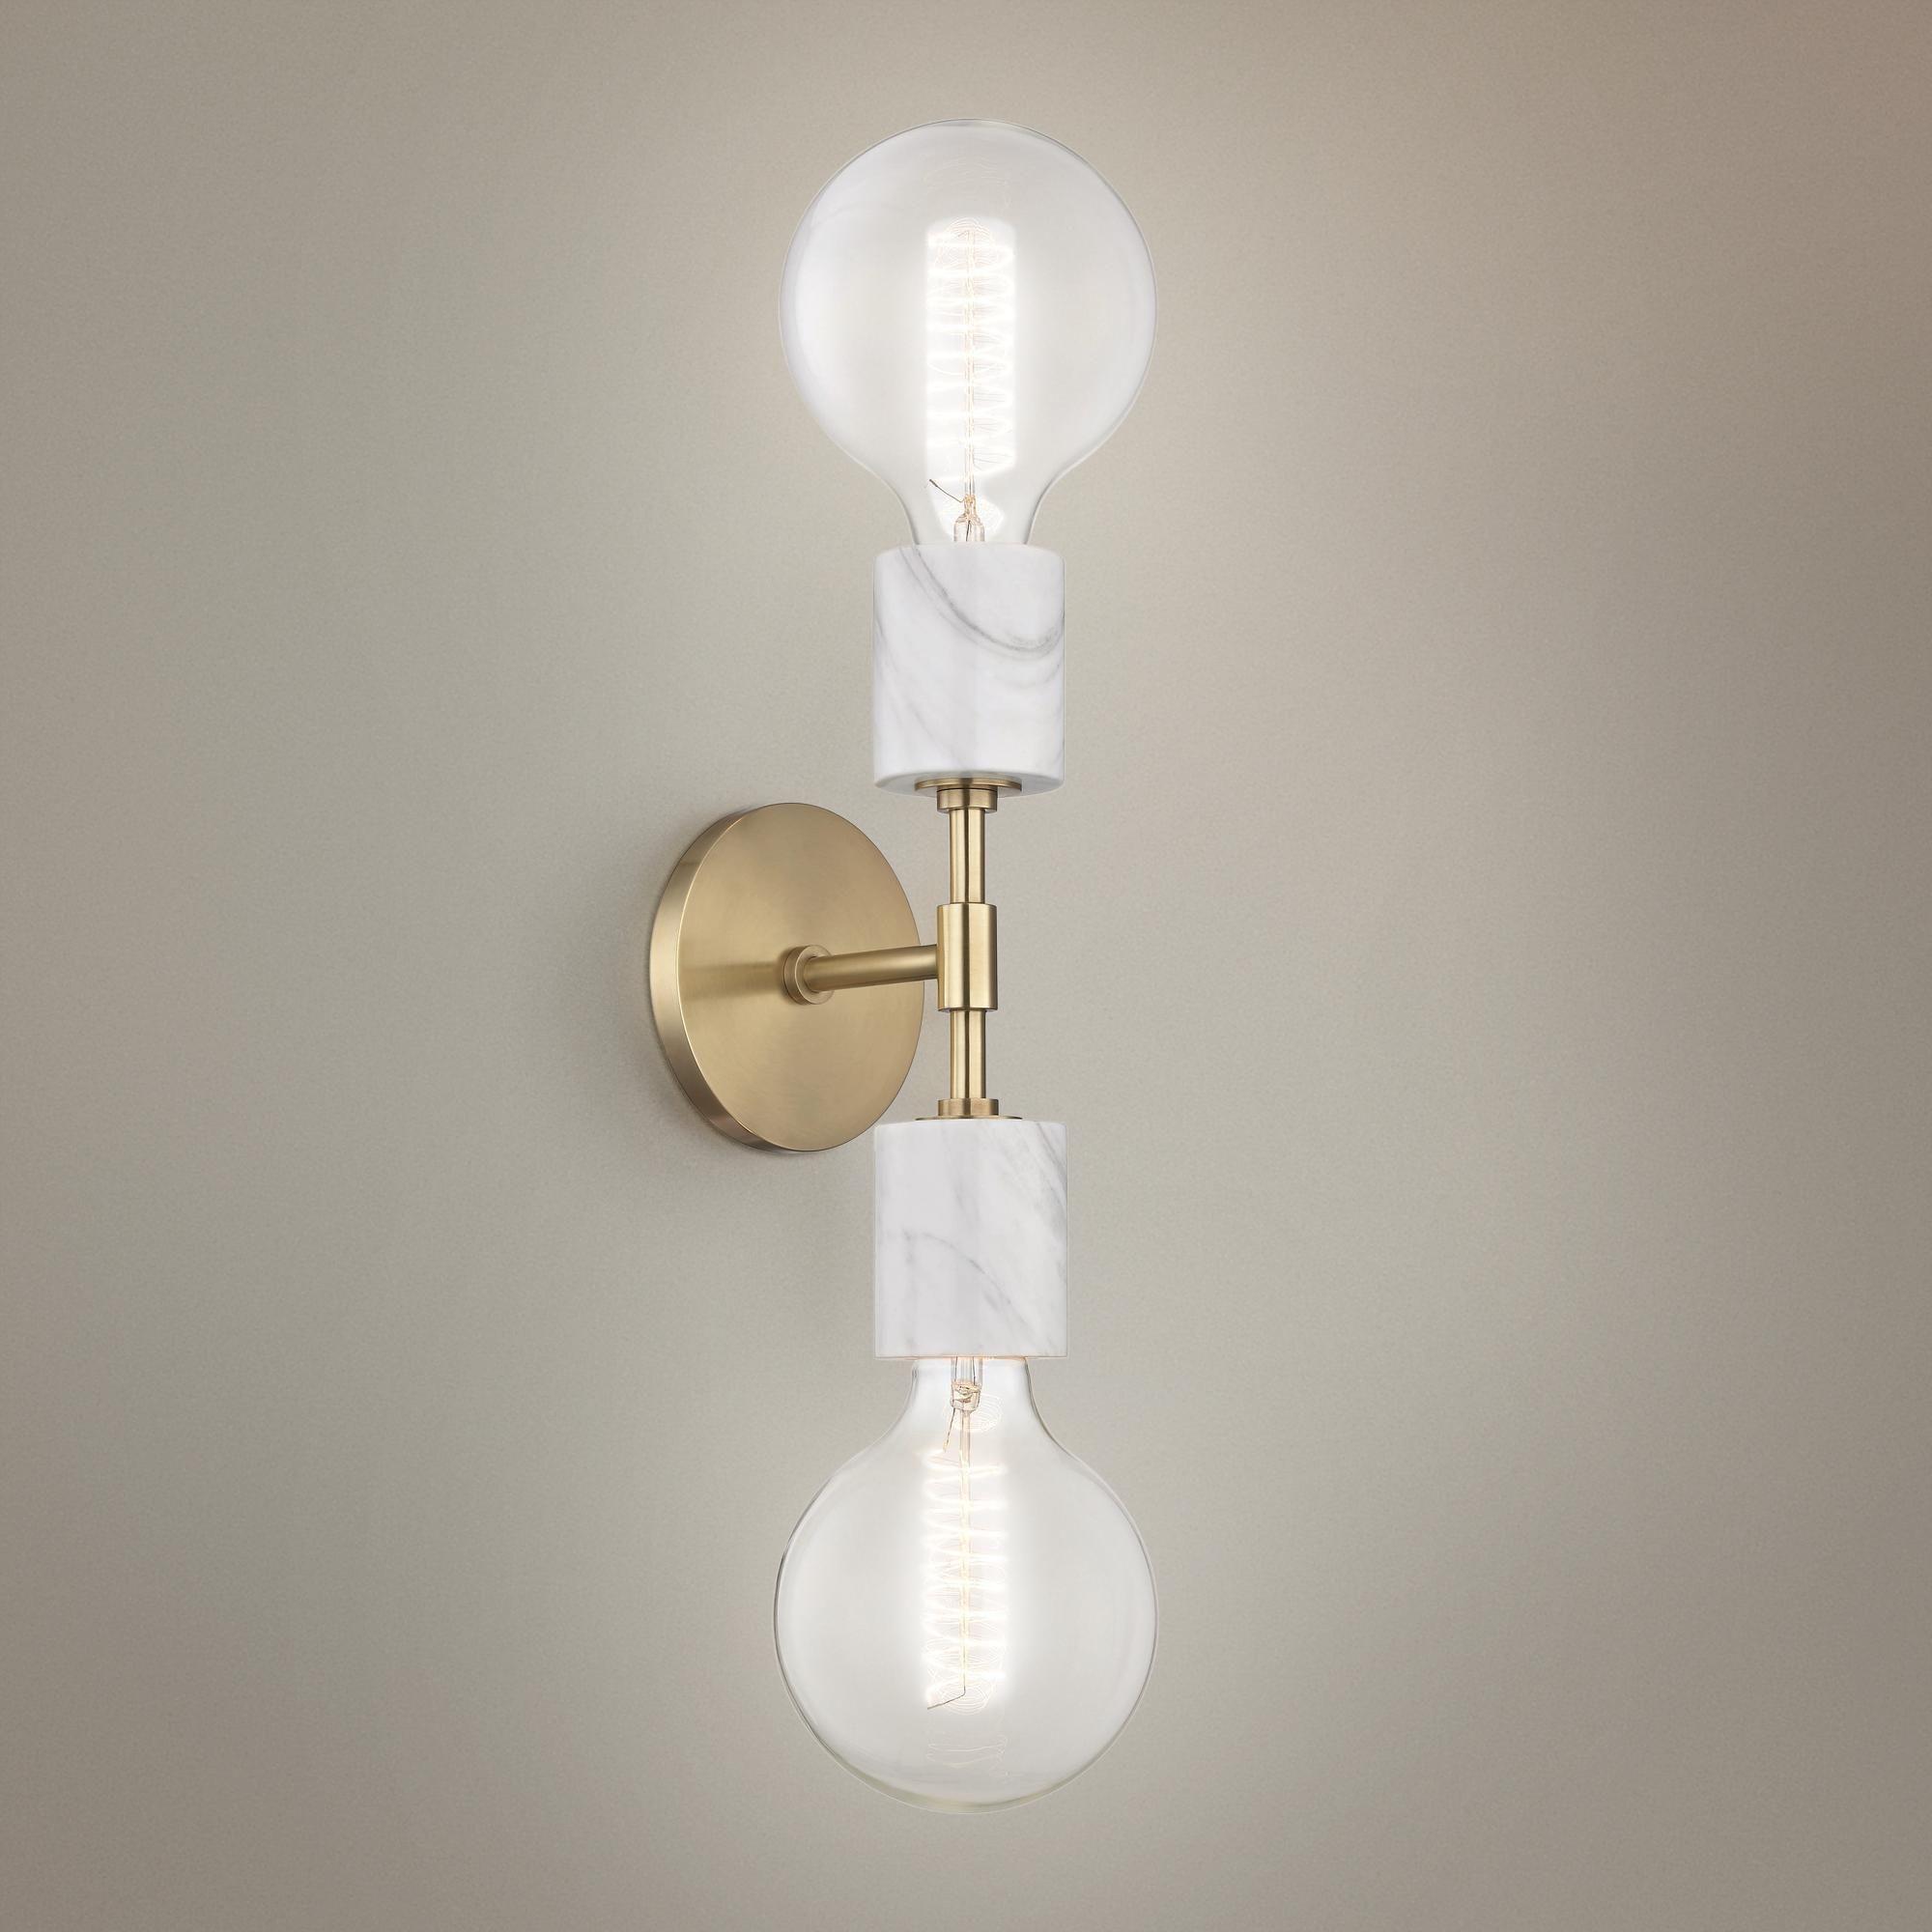 Capiz Shells Seashell Wall Lamp Scone Wall Lights Lighting Fixtures Home Decor